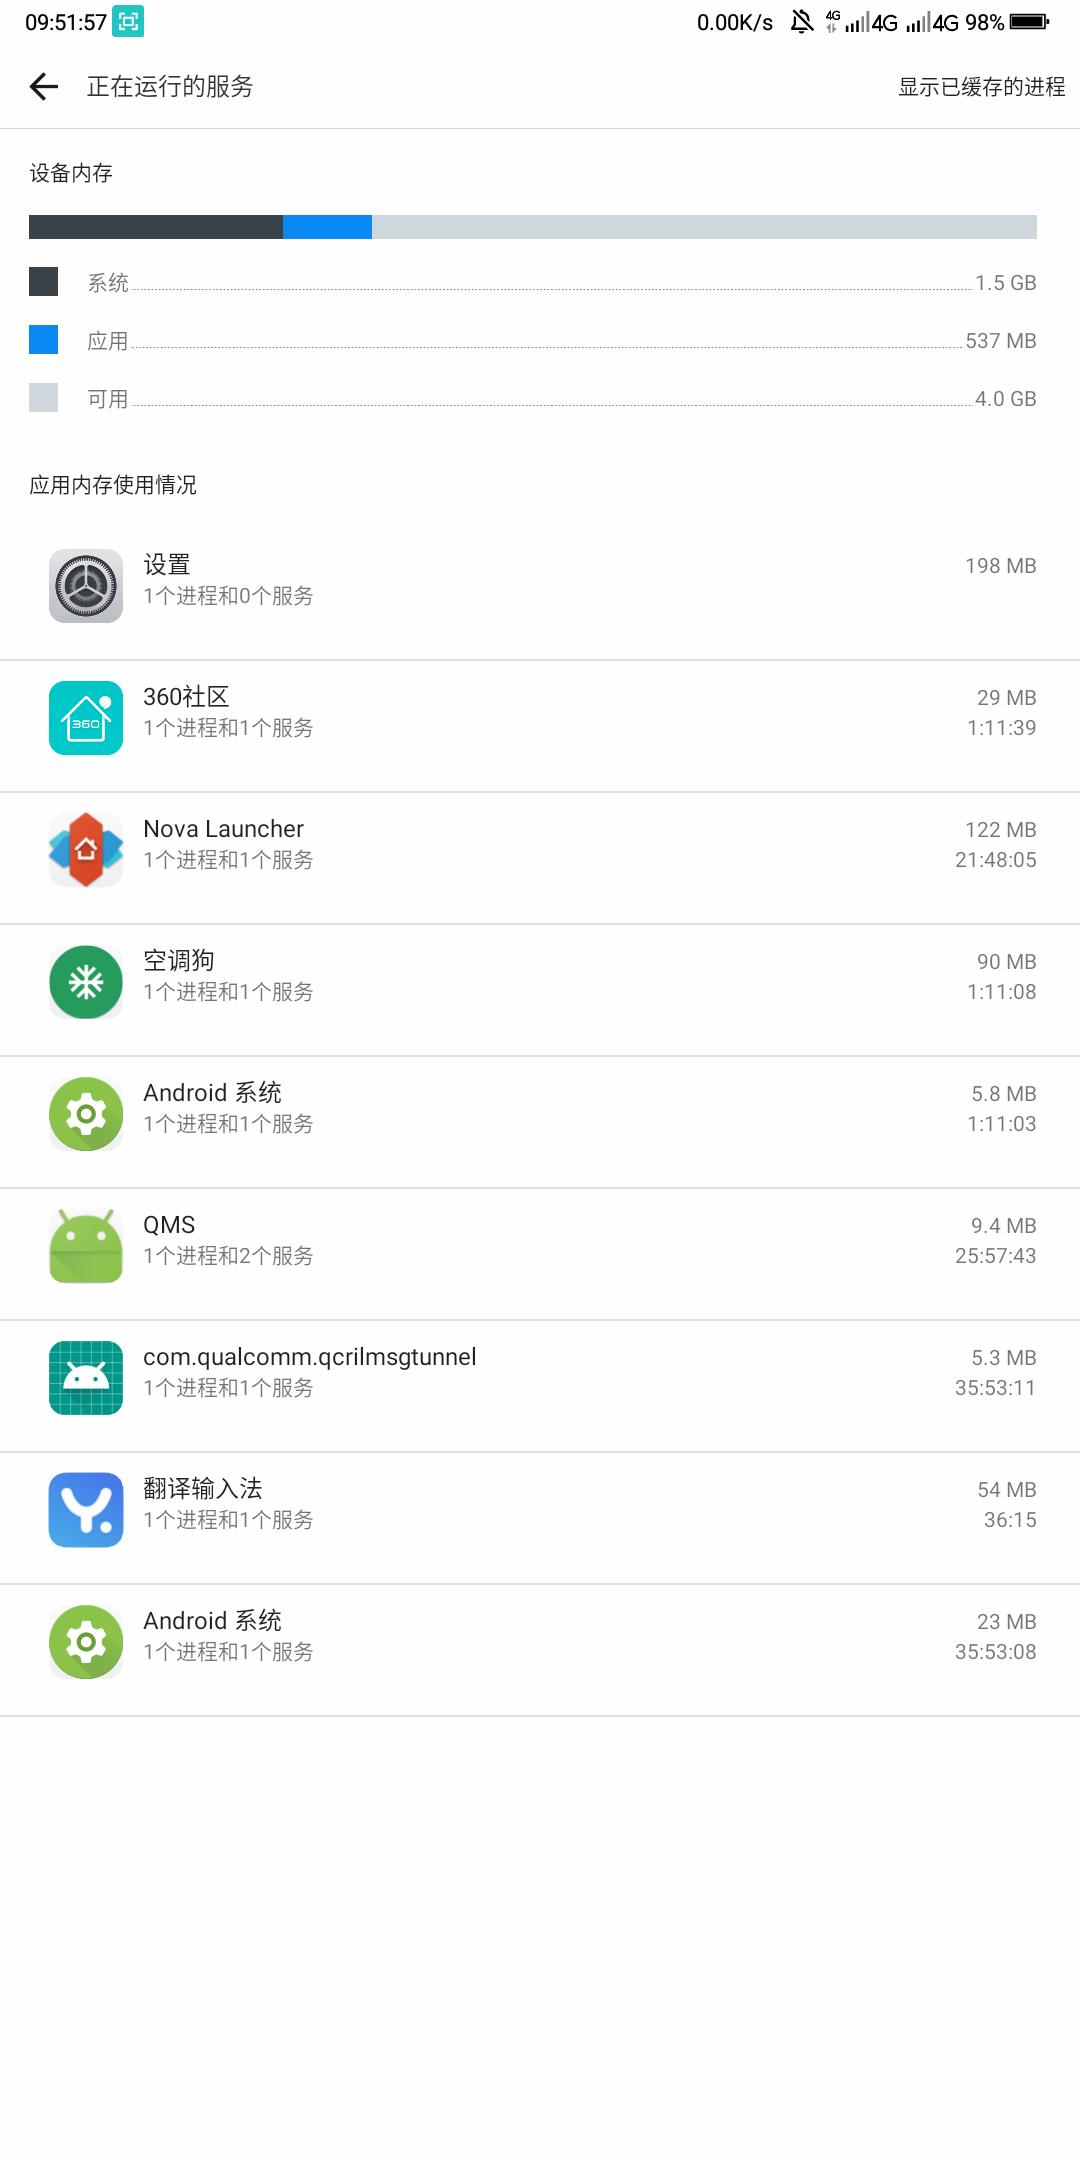 Screenshot_2018-10-11-09-51-58.png